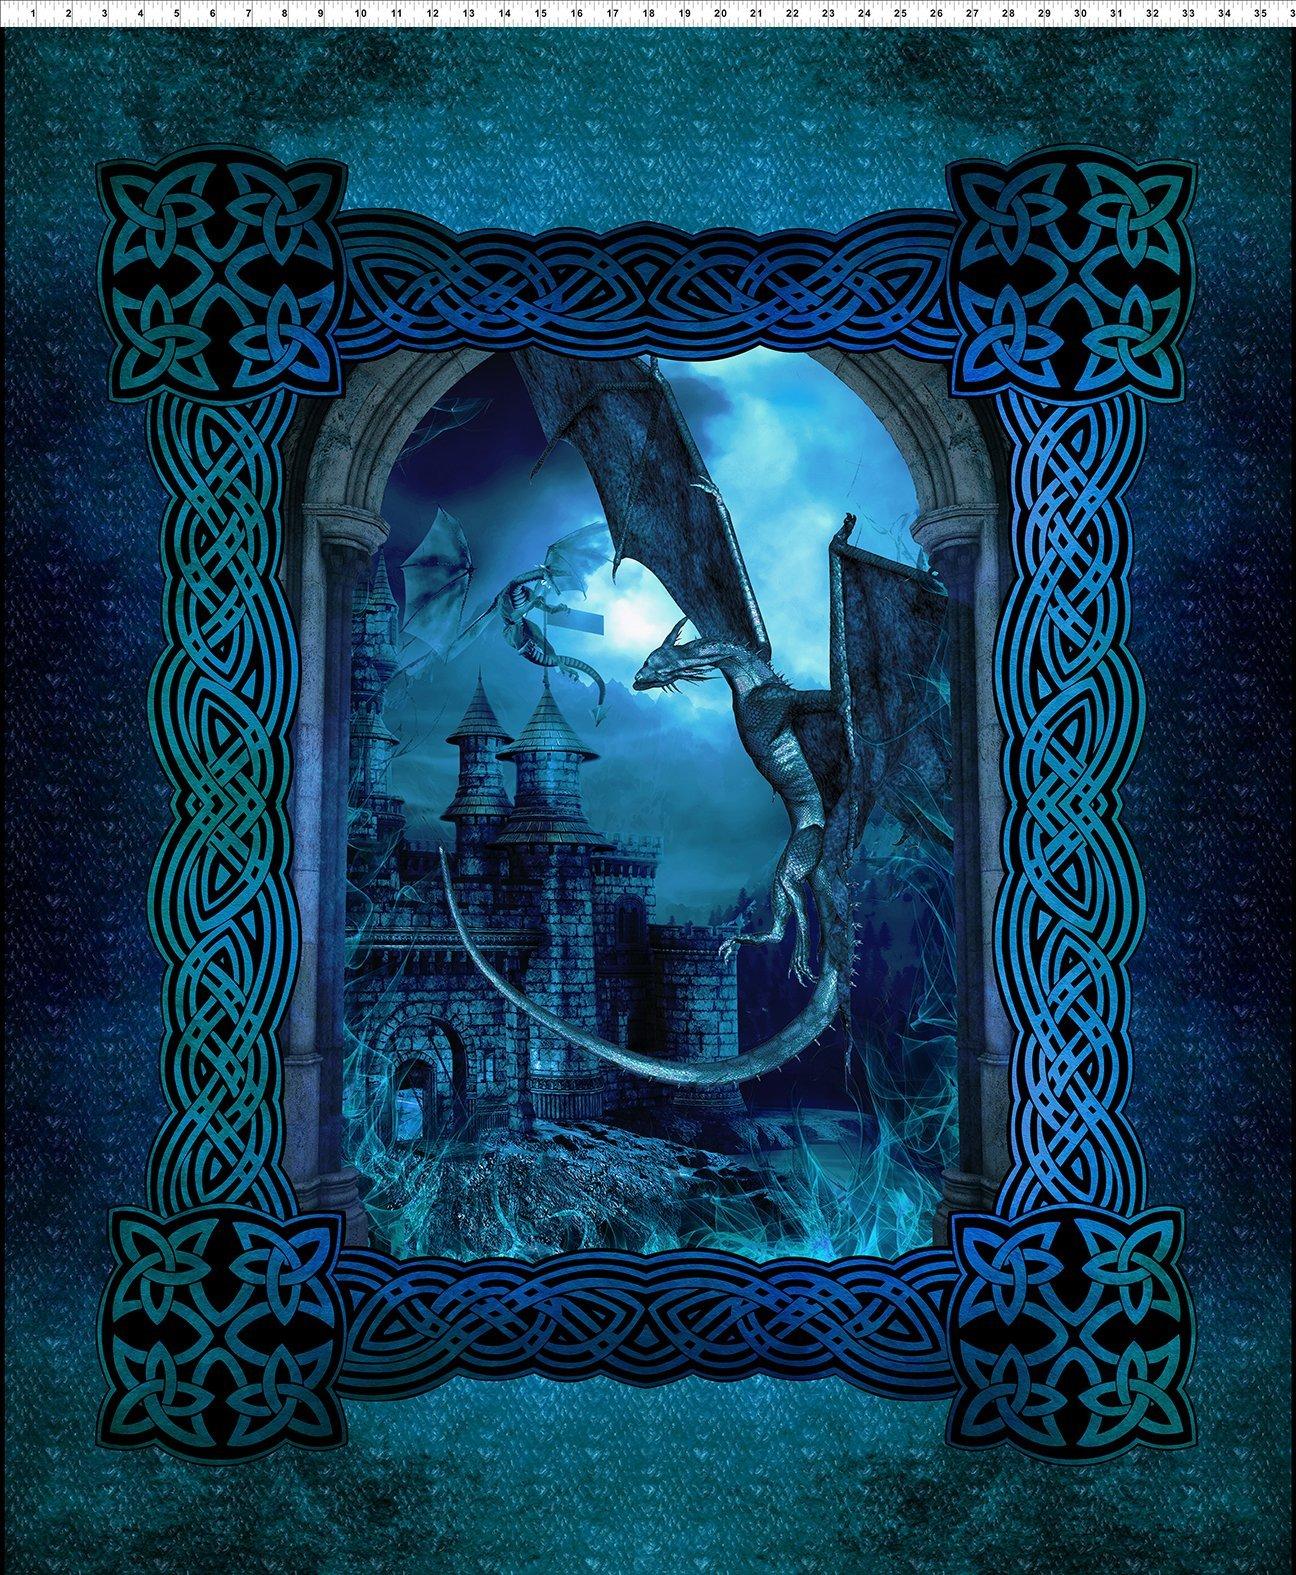 Dragons - Large Castle - Blue Fury - Digital Panel